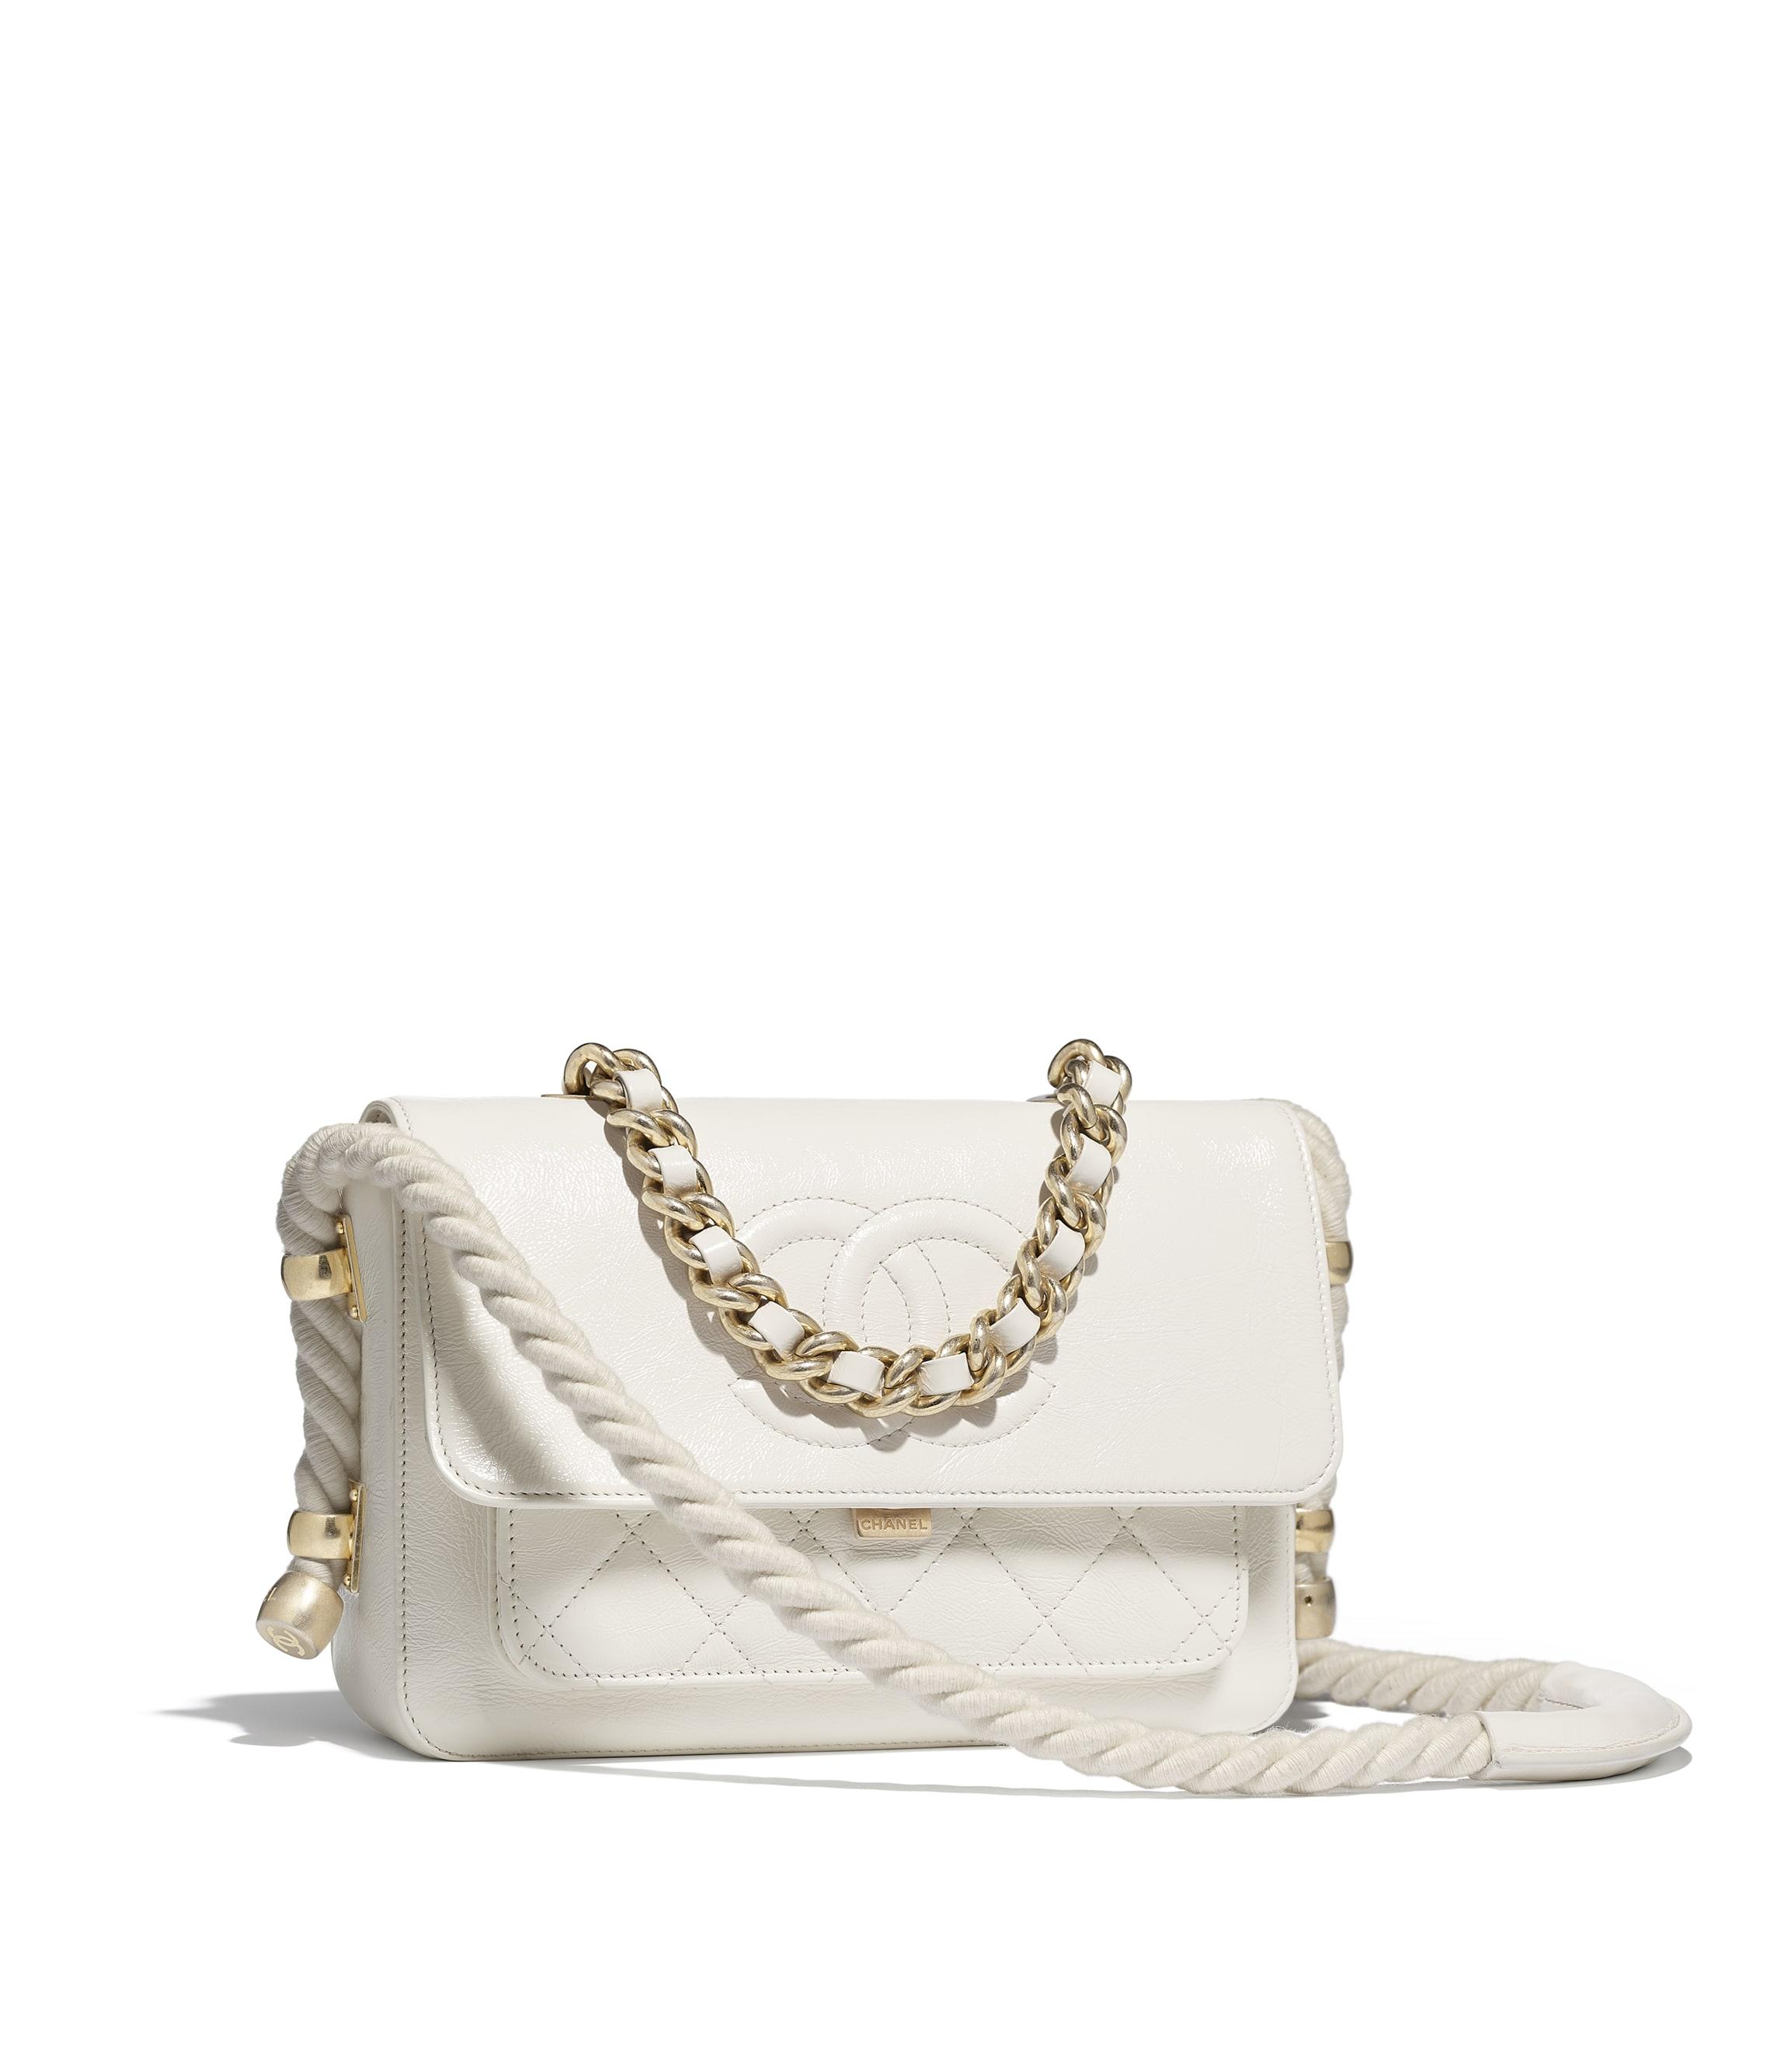 1c8c4bb5ac55ee Flap Bag, crumpled calfskin, cotton & gold-tone metal, white - CHANEL